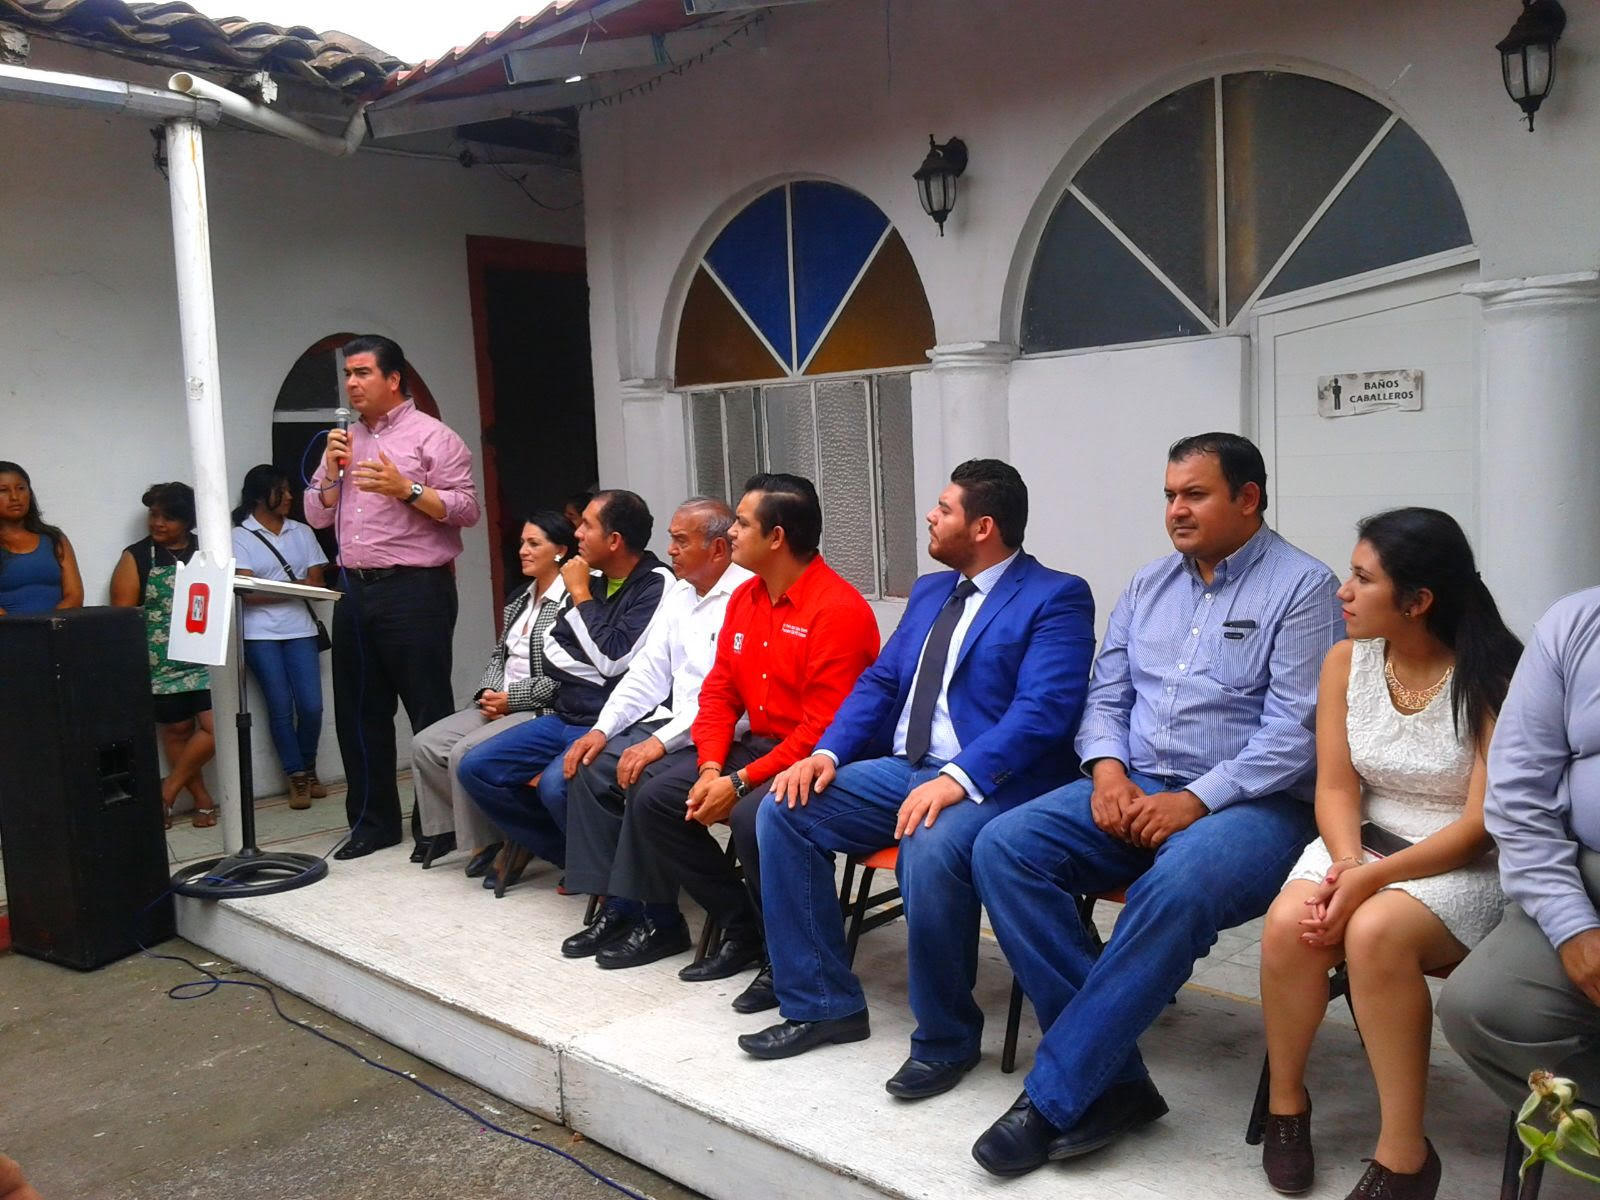 Pri abre comedor comunitario en coatepec lic cessa for Proyecto social comedor comunitario